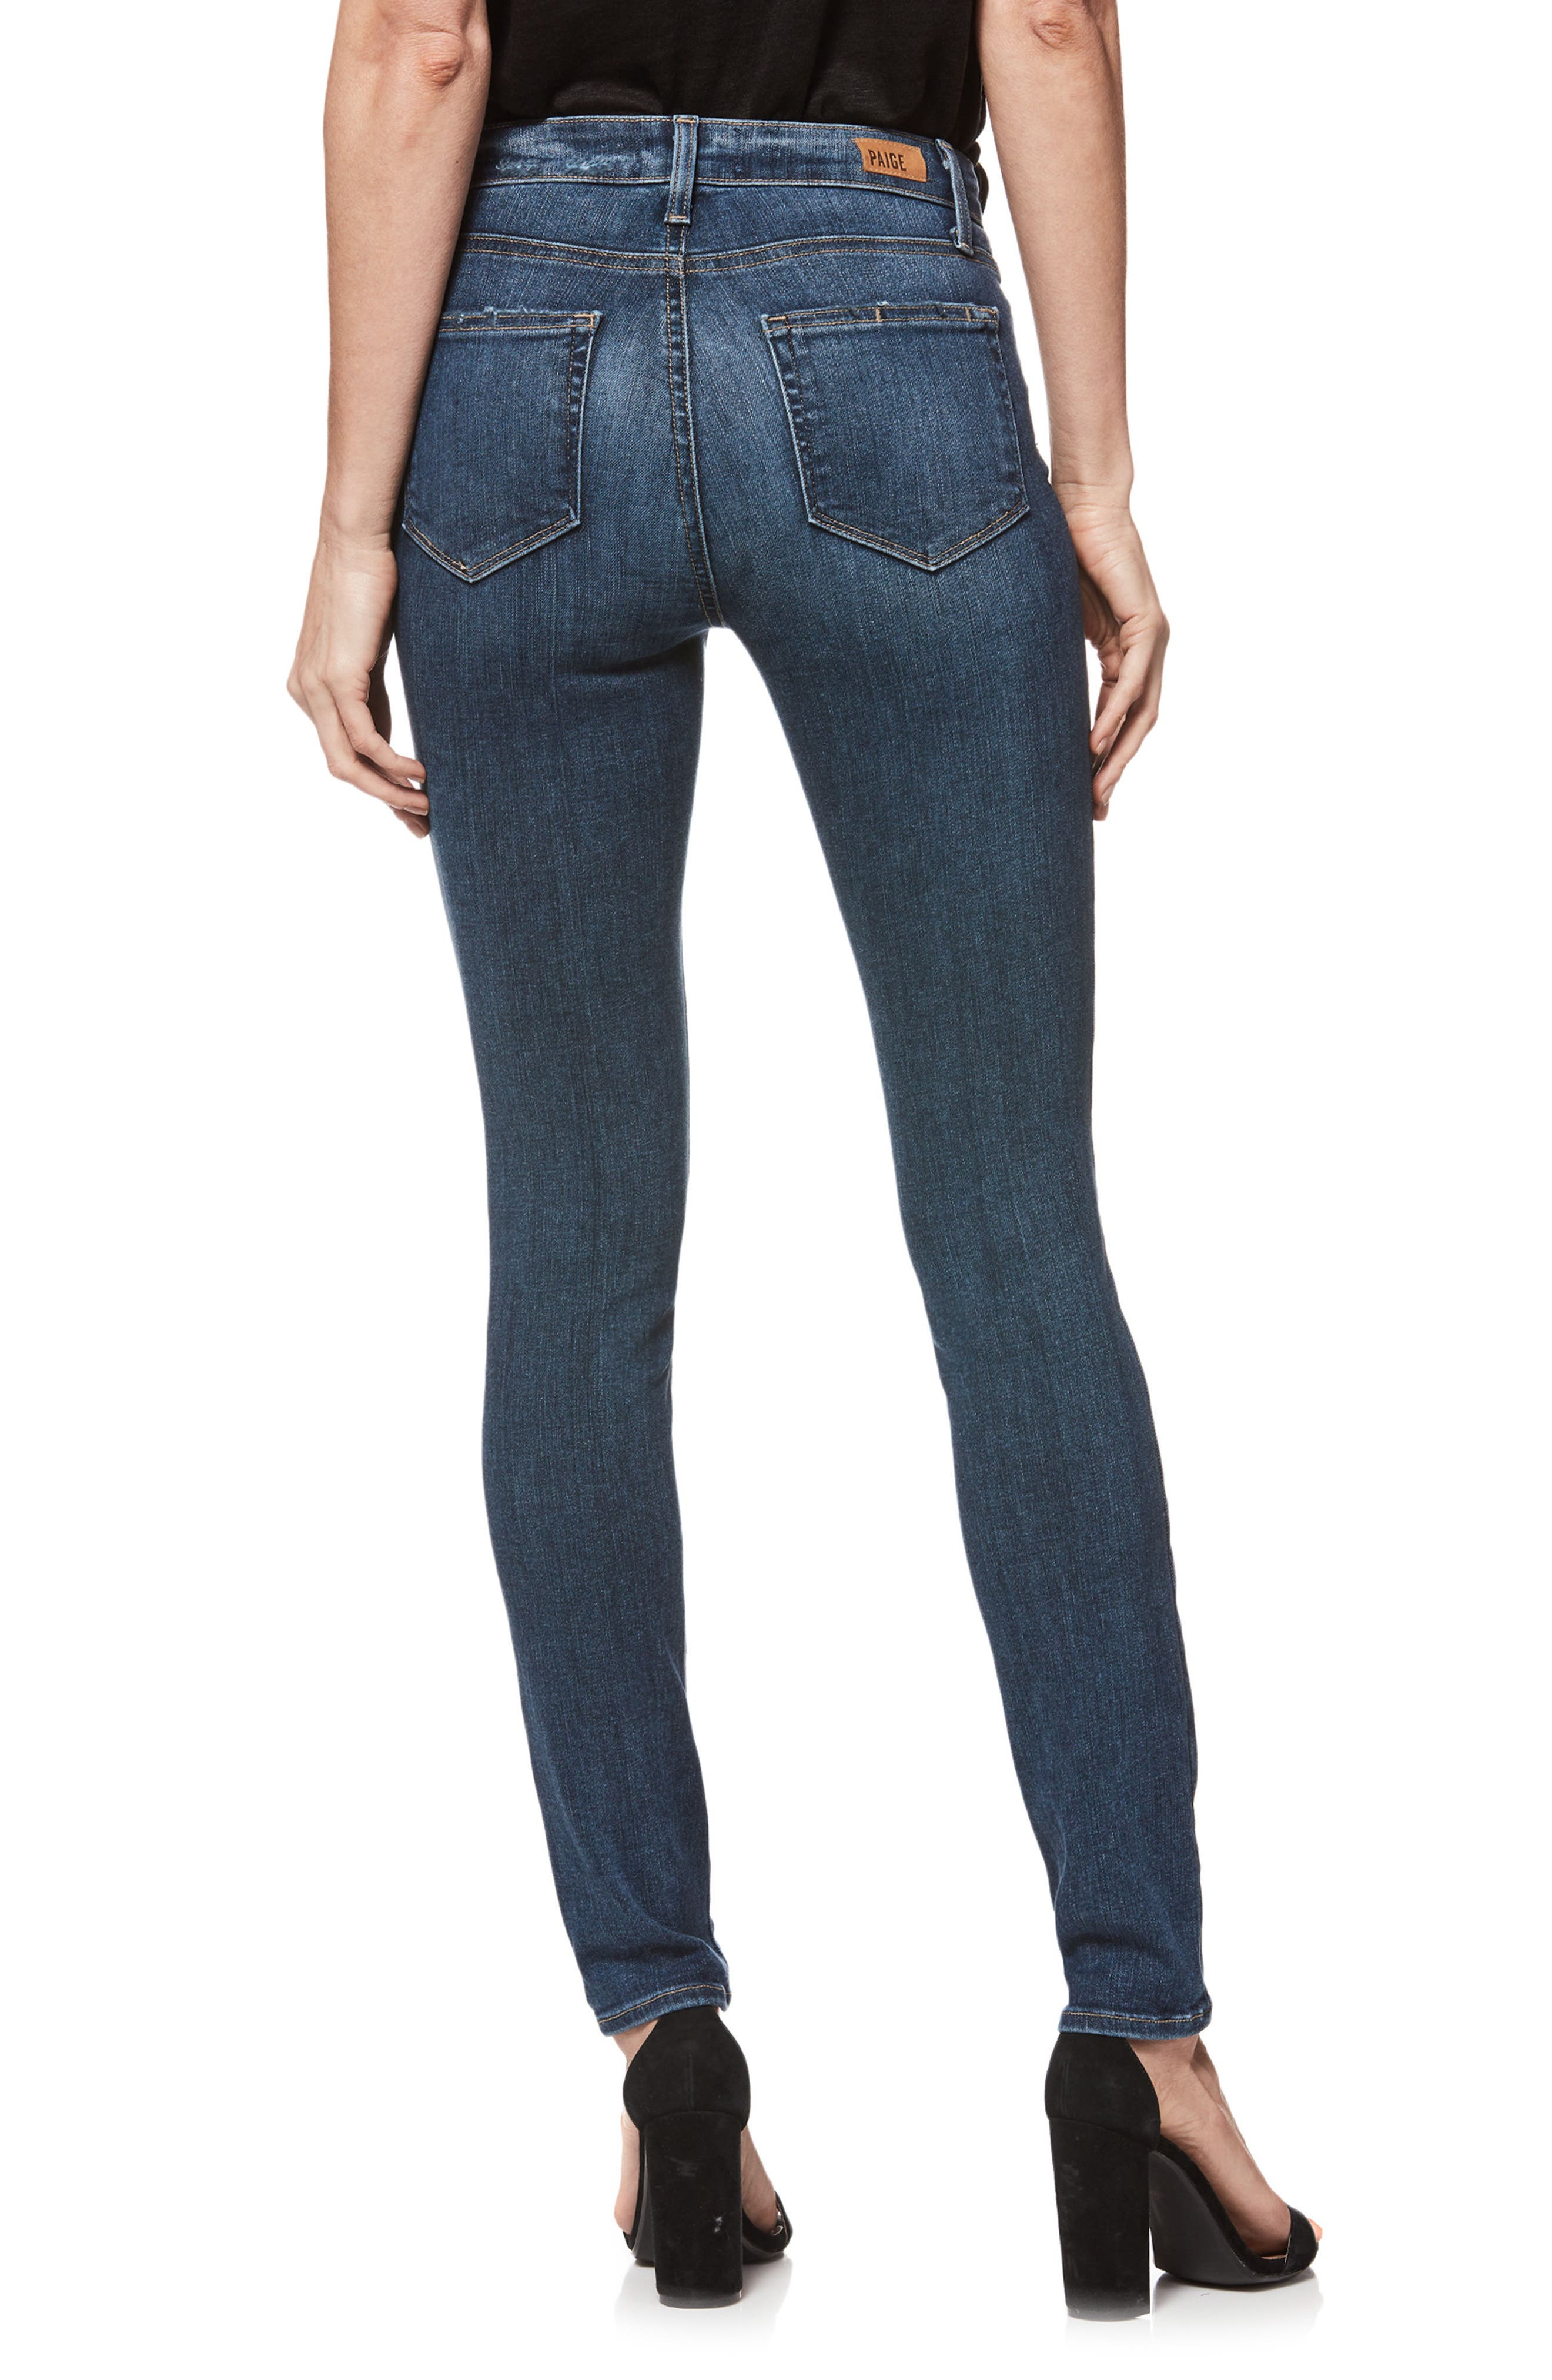 Transcend Vintage - Hoxton High Waist Ultra Skinny Jeans,                             Alternate thumbnail 2, color,                             India